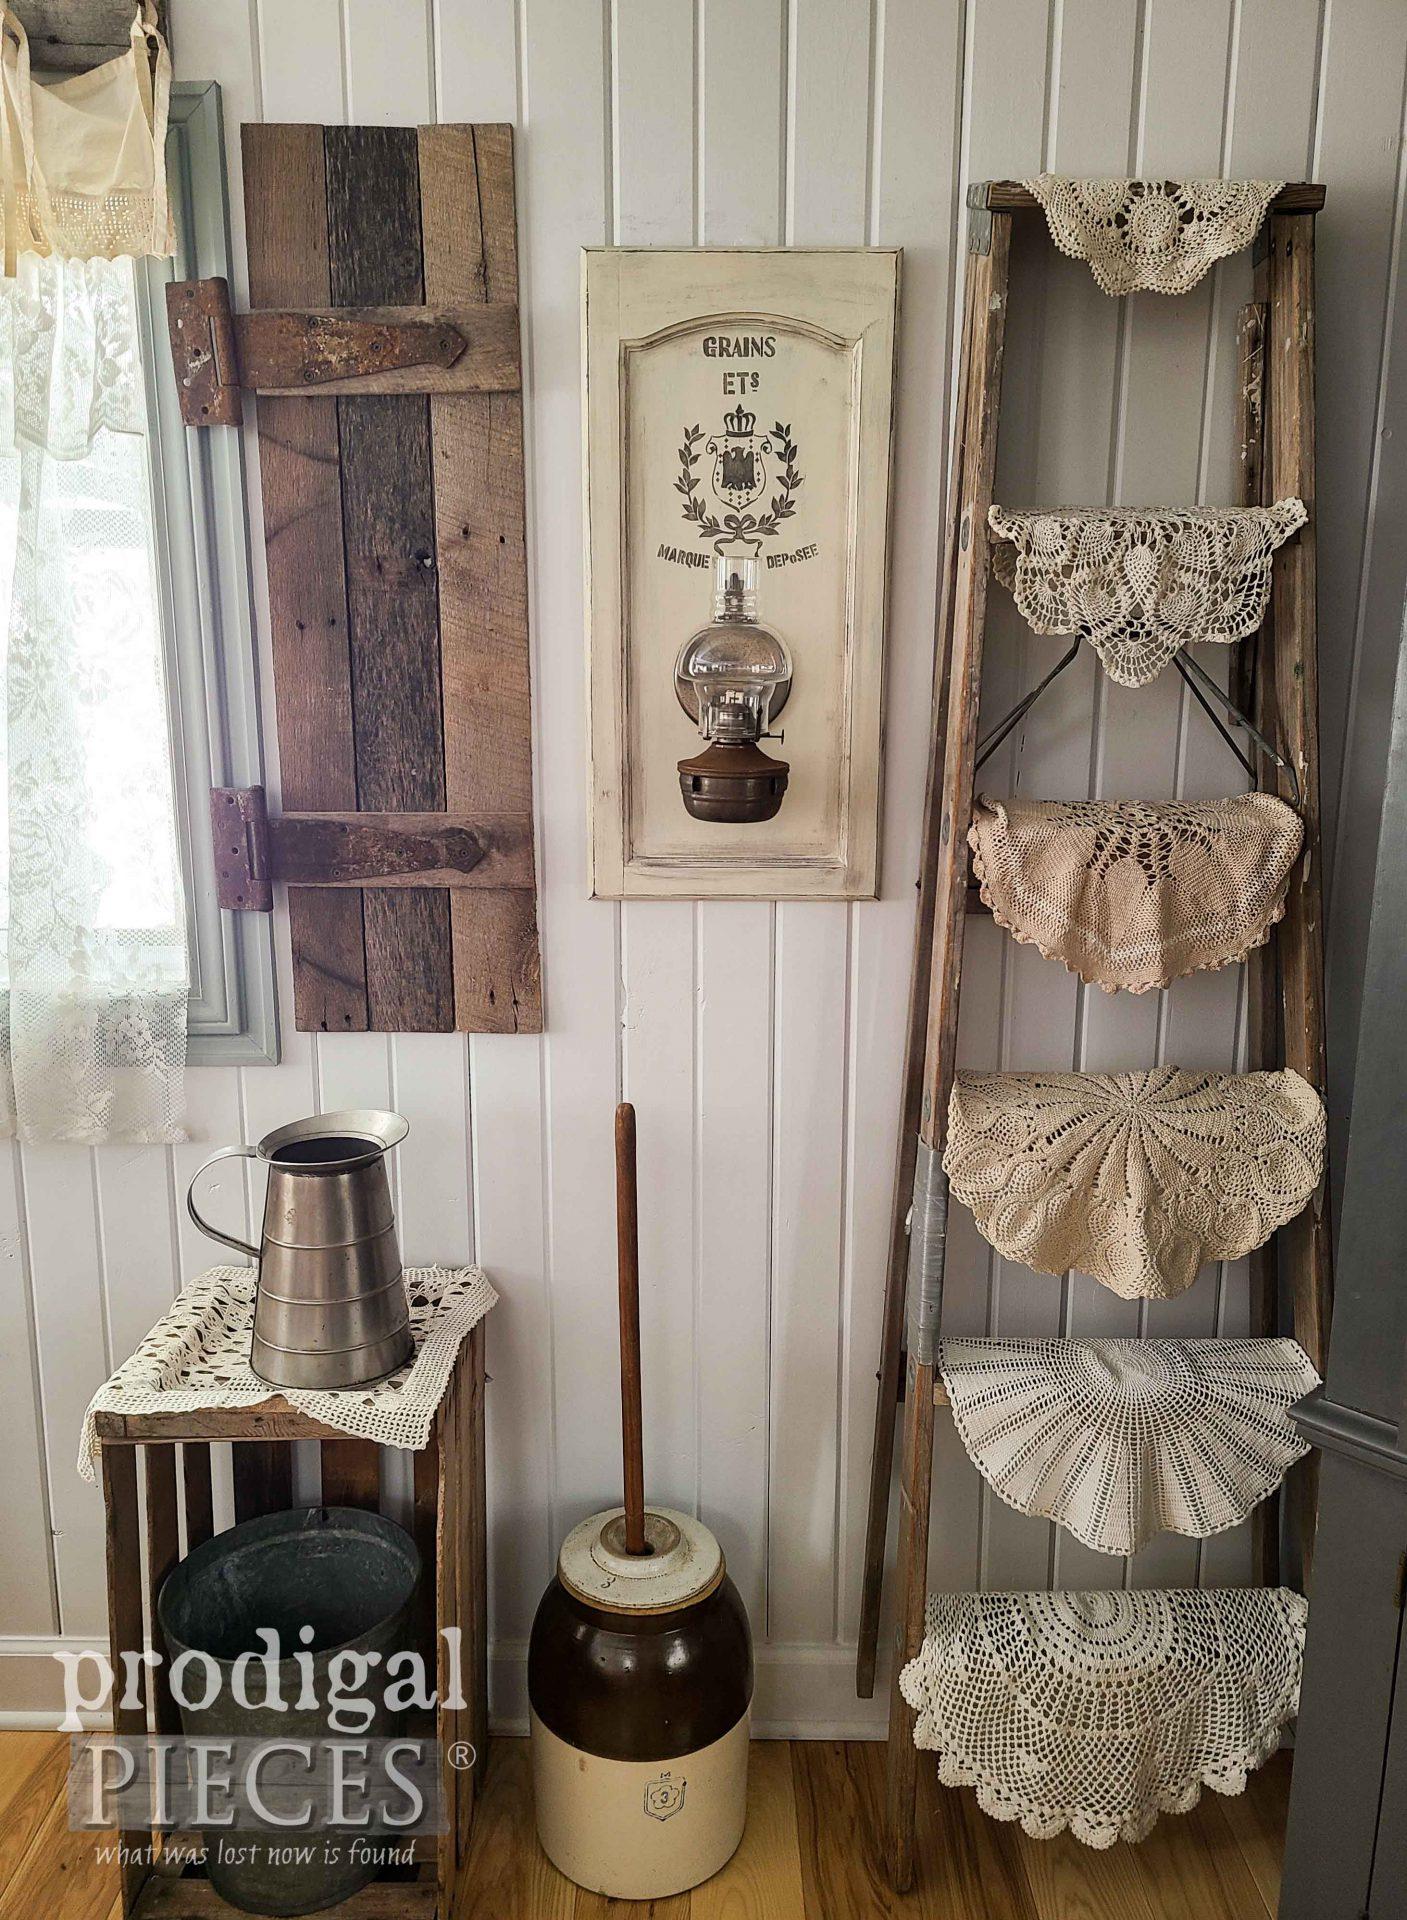 Farmhouse Oil Lamp for Home Decor by Larissa of Prodigal Pieces | prodigalpieces.com #prodigalpieces #farmhouse #diy #home #homedecor